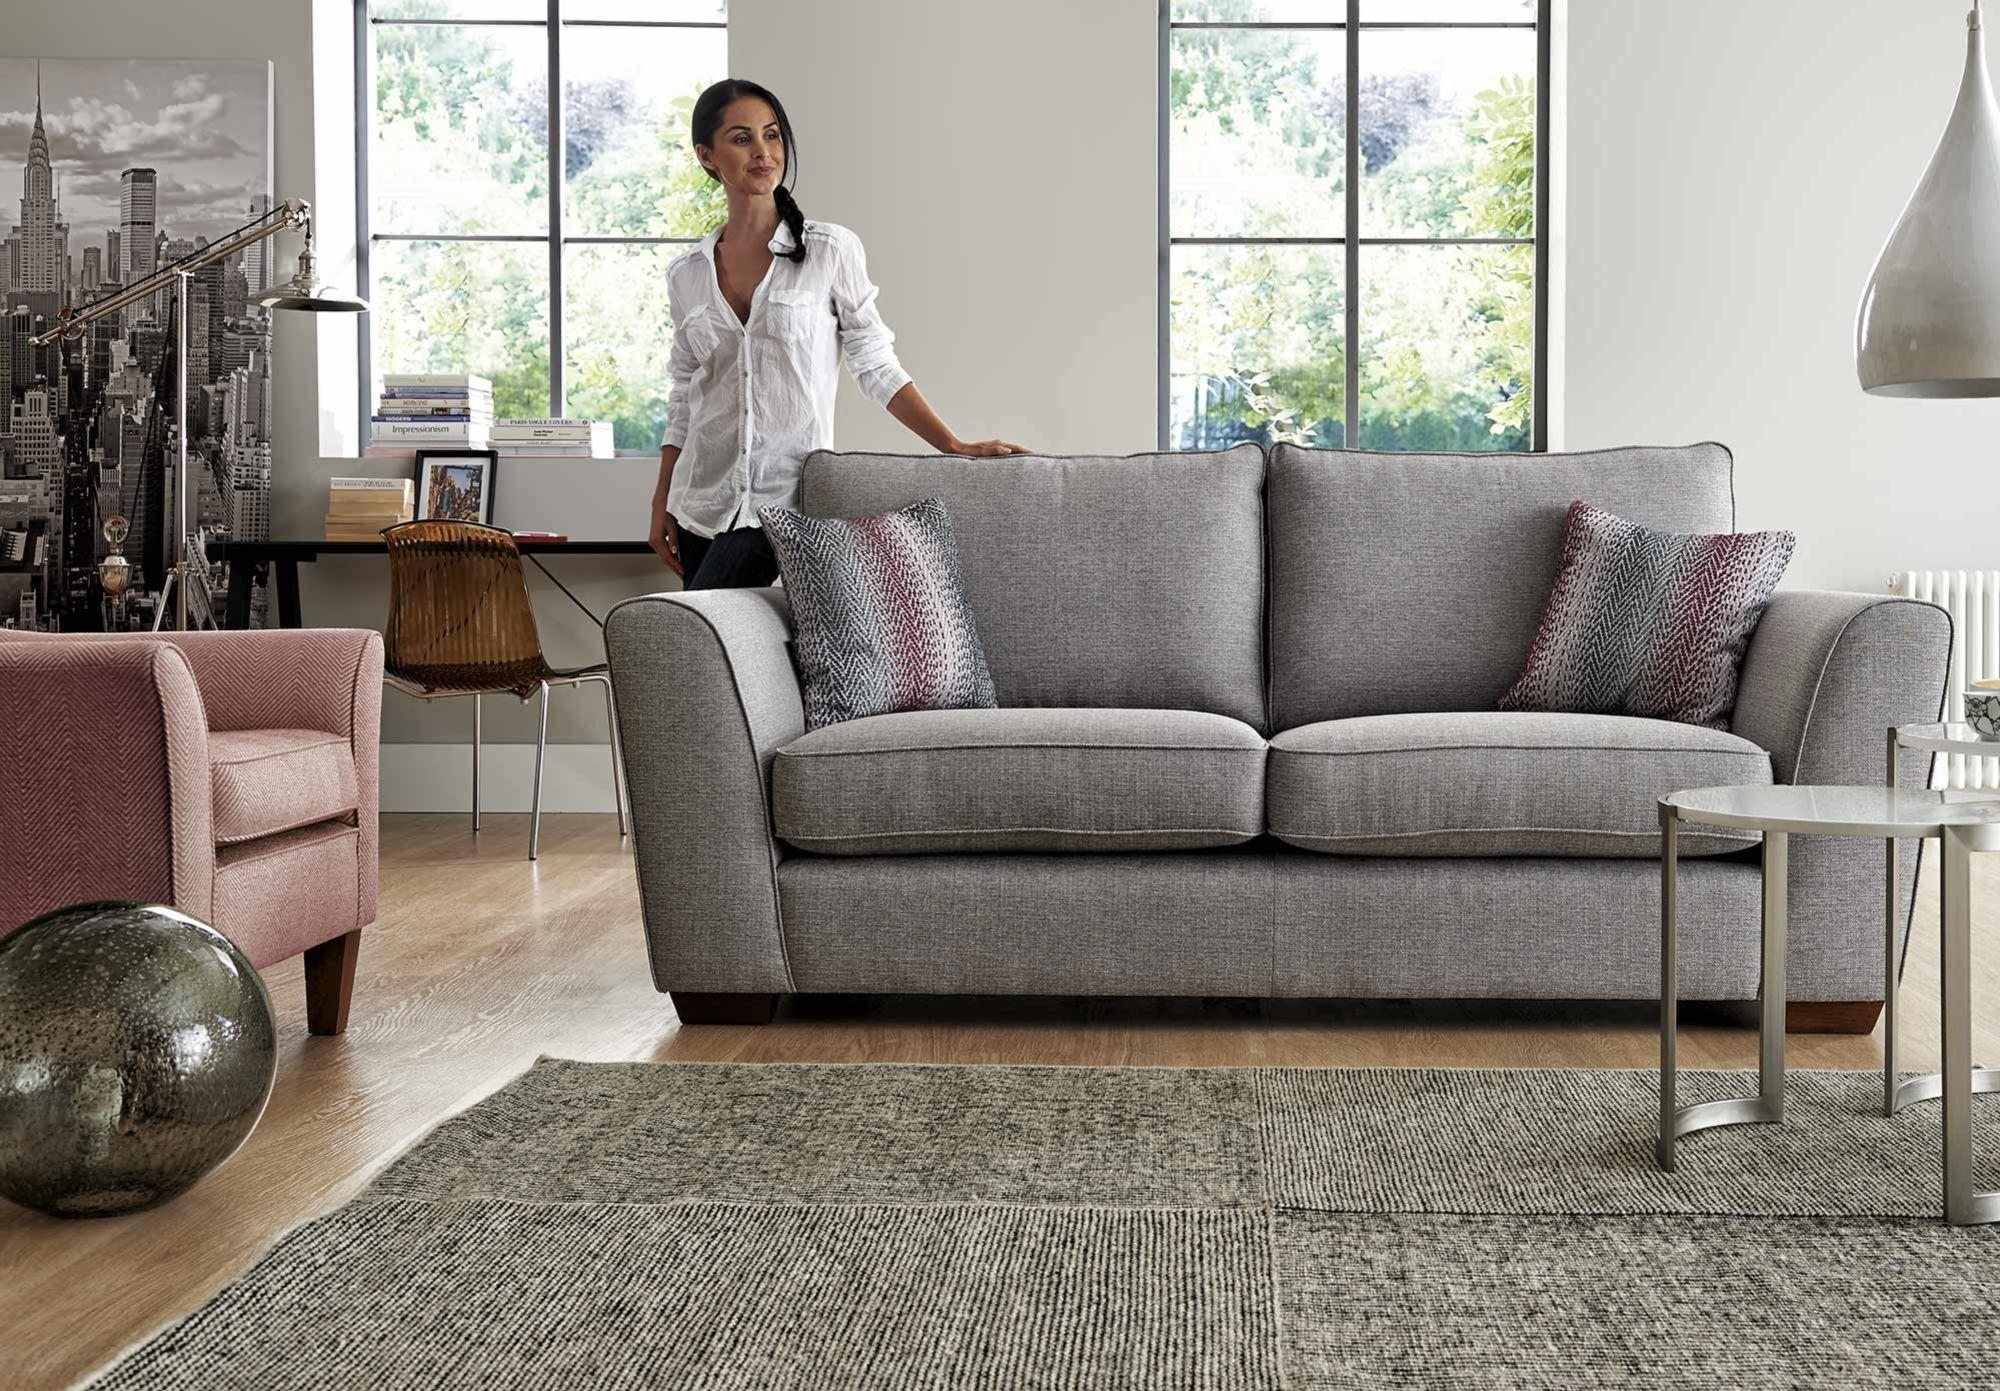 The UKu0027s Largest Independent Furniture Retailer Large